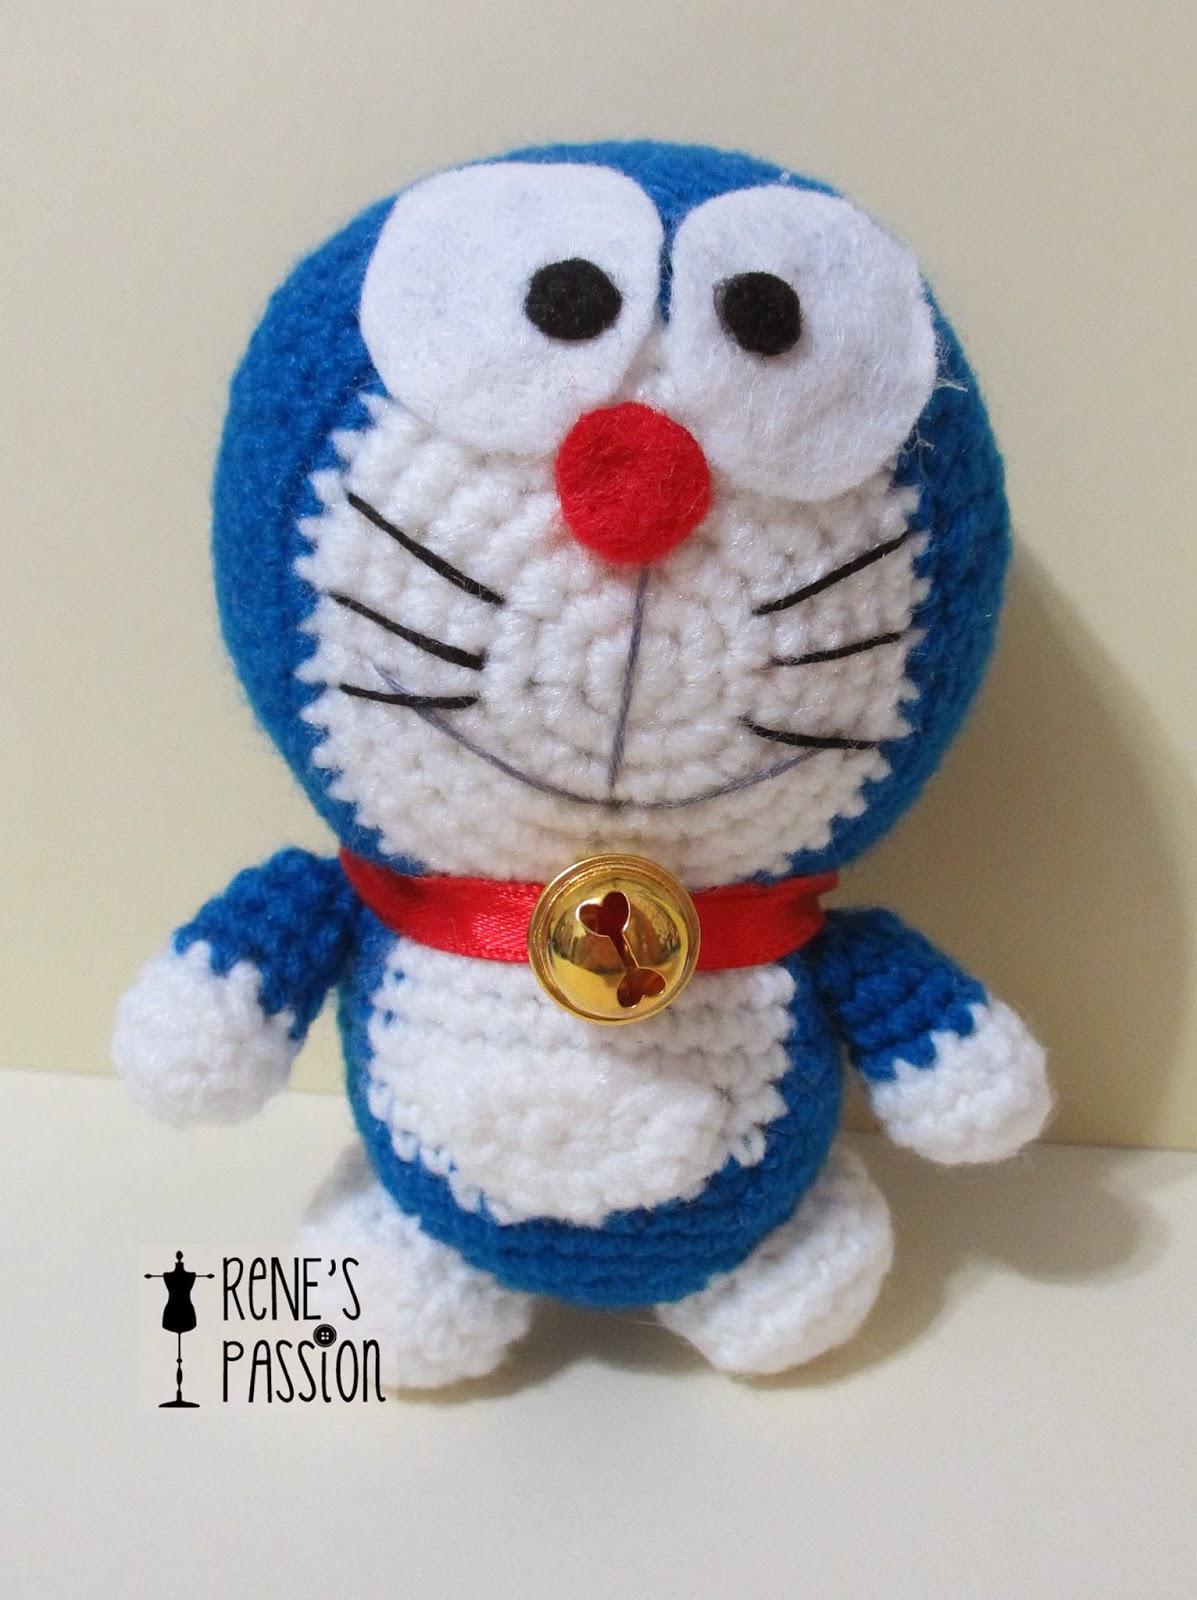 Amigurumi Doraemon Tutorial : My Couture Sewing Journey: My amigurumi Doraemon!